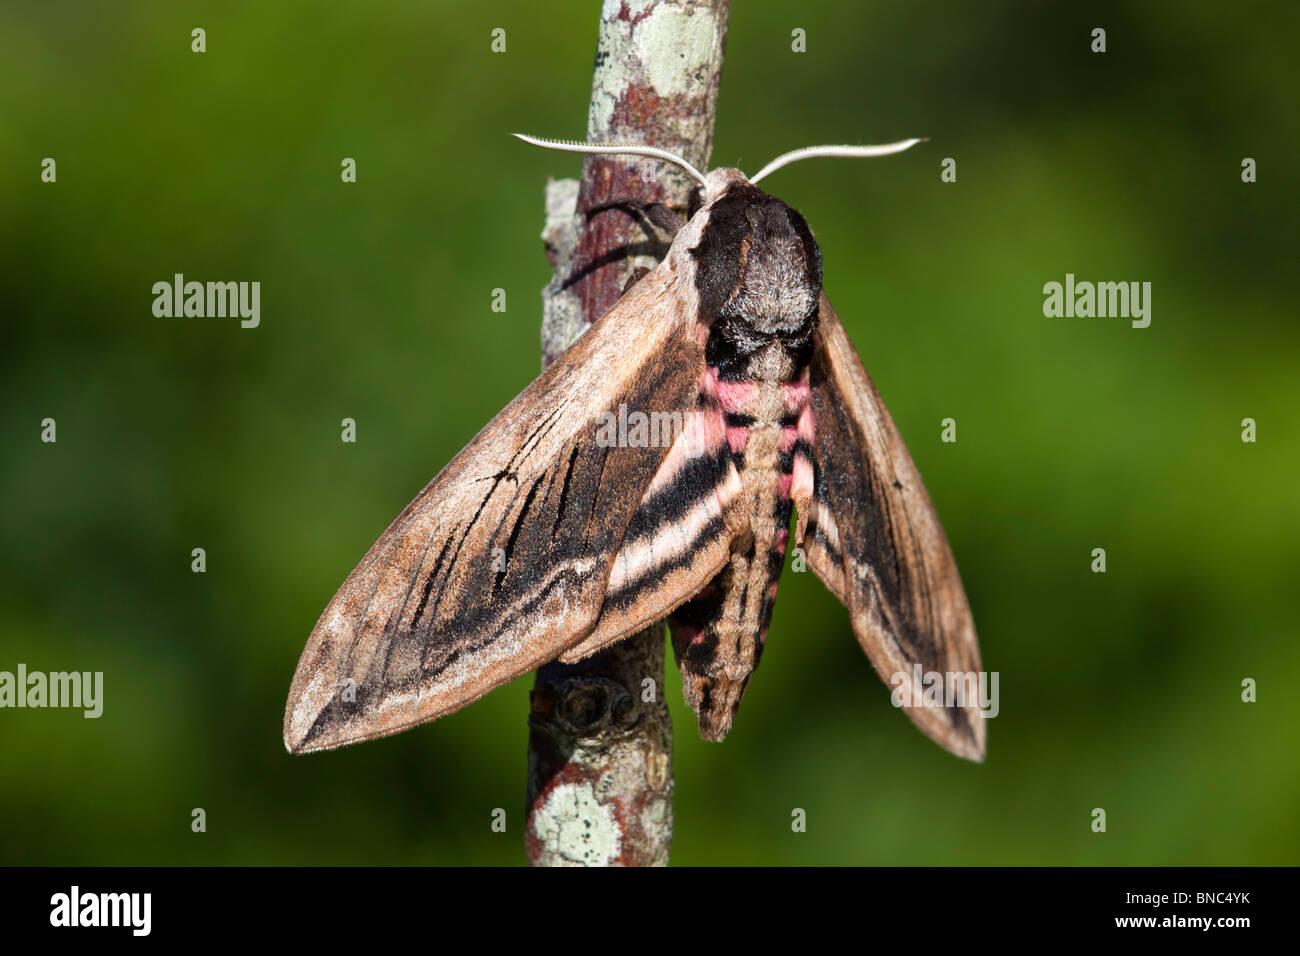 Privet Hawkmoth; Sphinx ligustri; on a twig - Stock Image